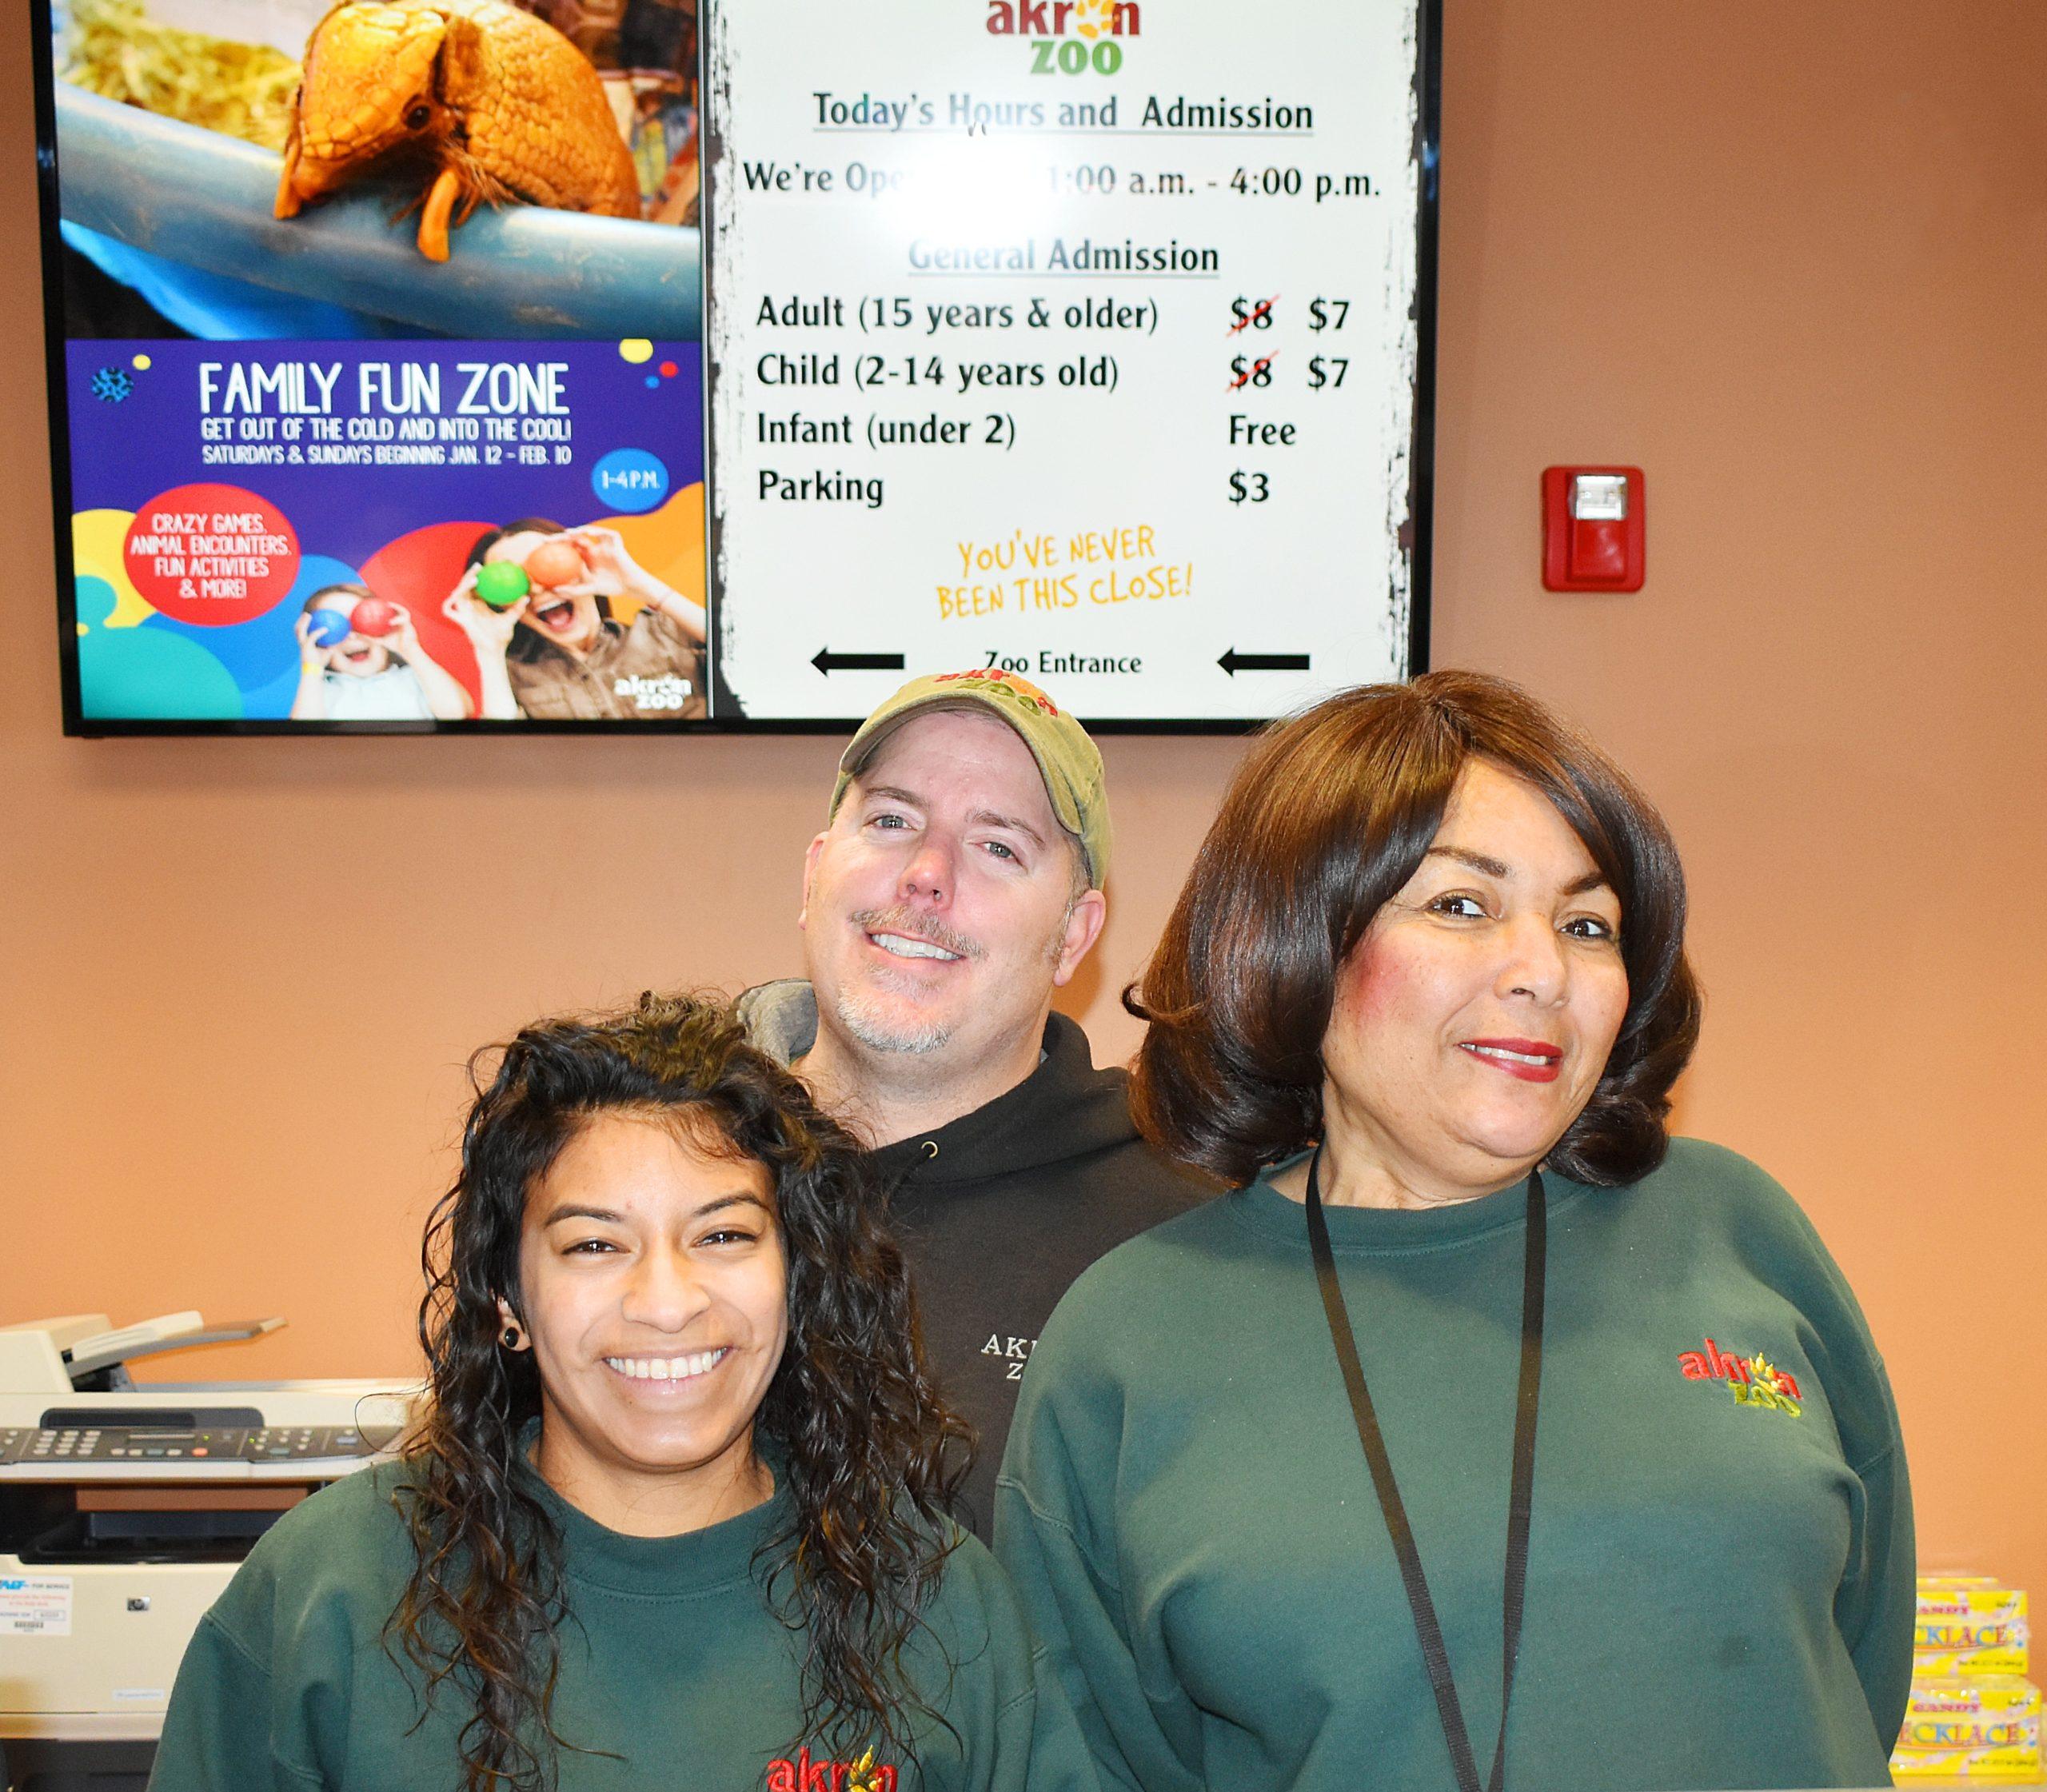 Akron Zoo To Host Job Fair February 8 9 Wadsworth Community Radio